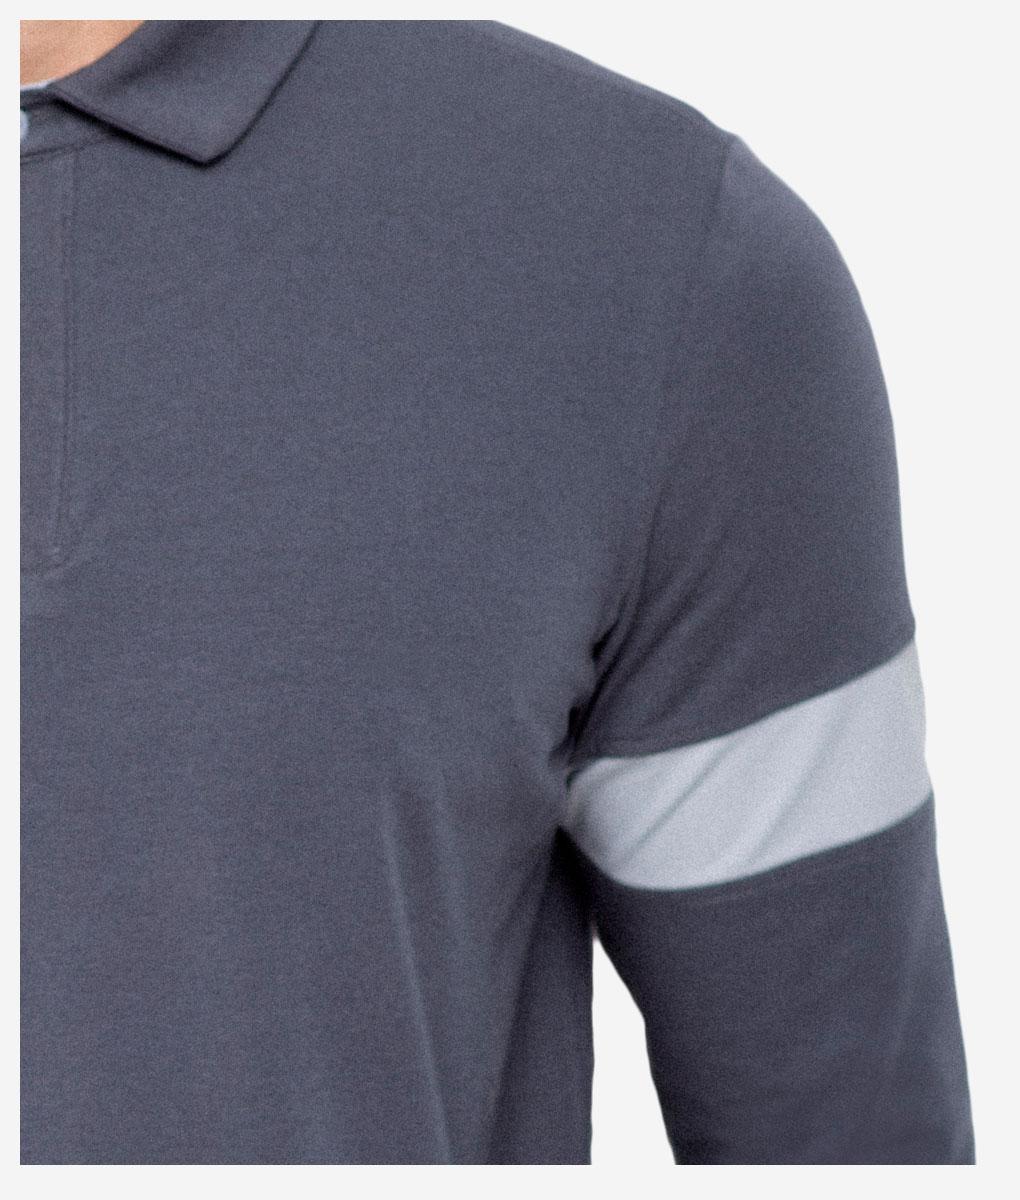 Transparent-casual-cycling-titanium-classic-shoulder-detail-2